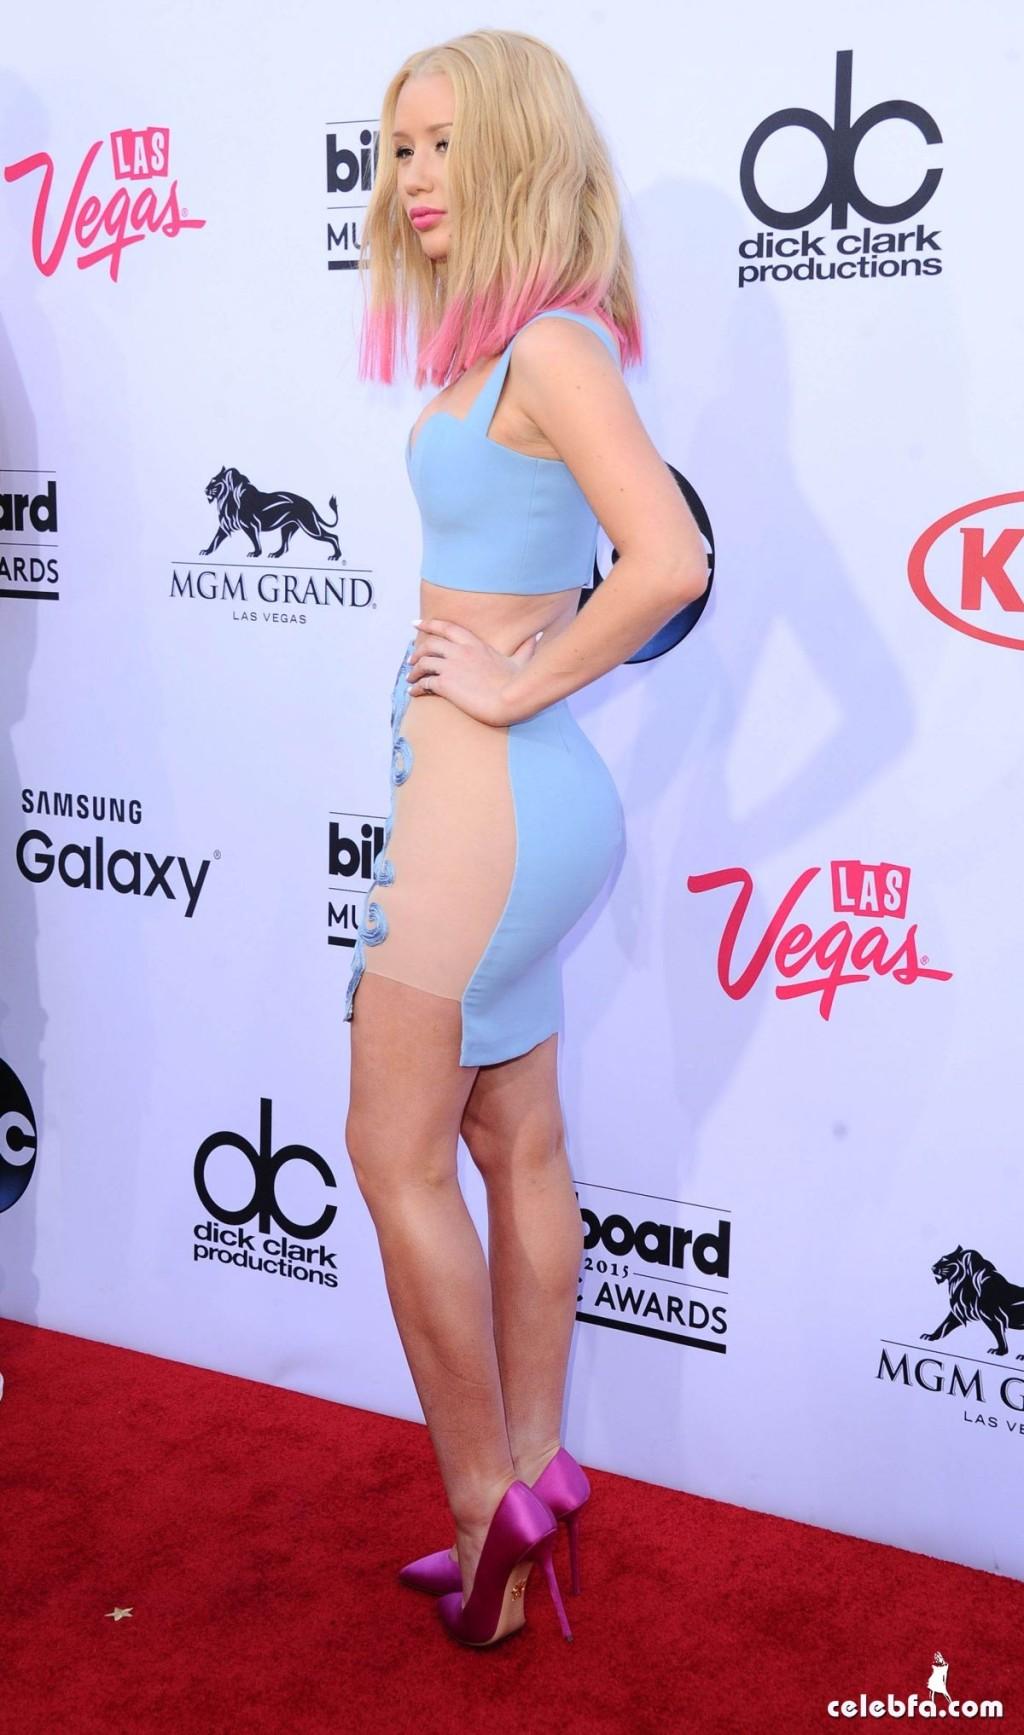 IGGY AZALEA at 2015 Billboard Music Awards (4)